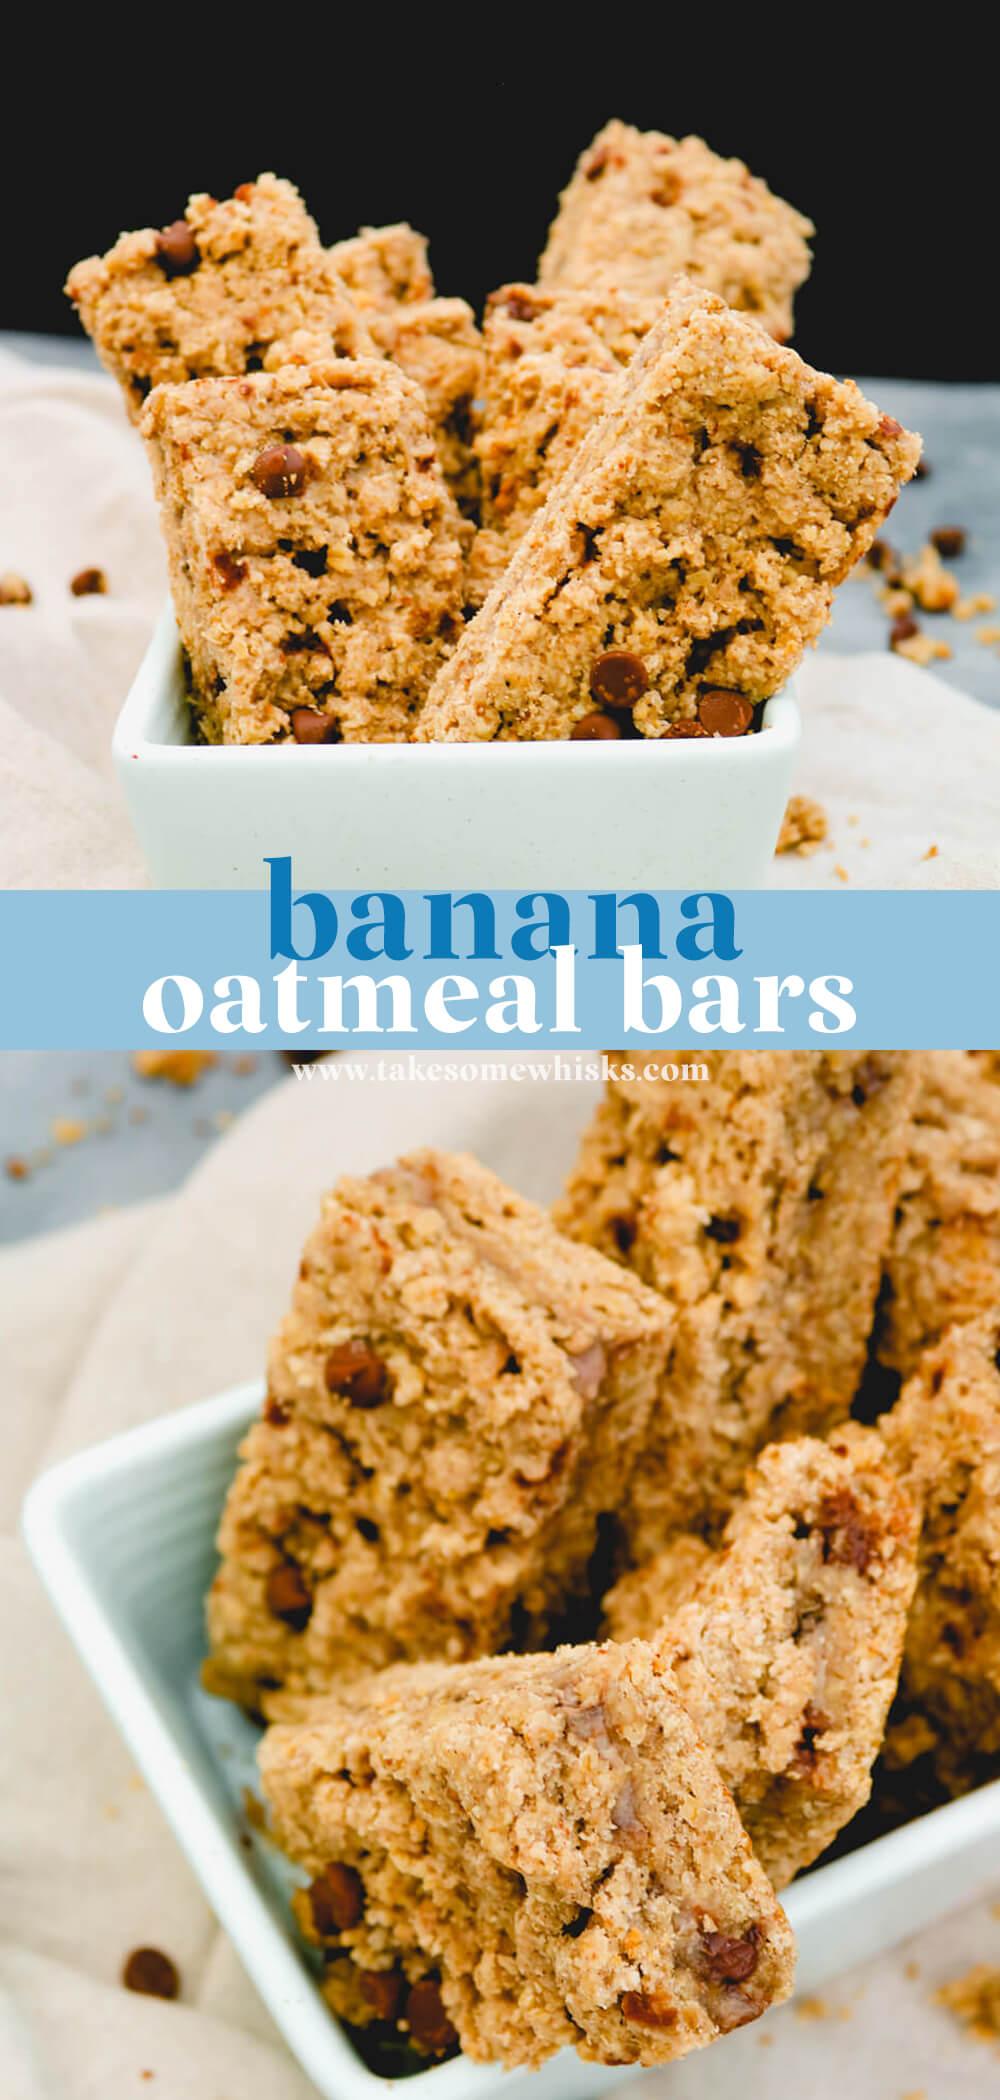 Banana Oatmeal Bars (DF)   Take Some Whisks